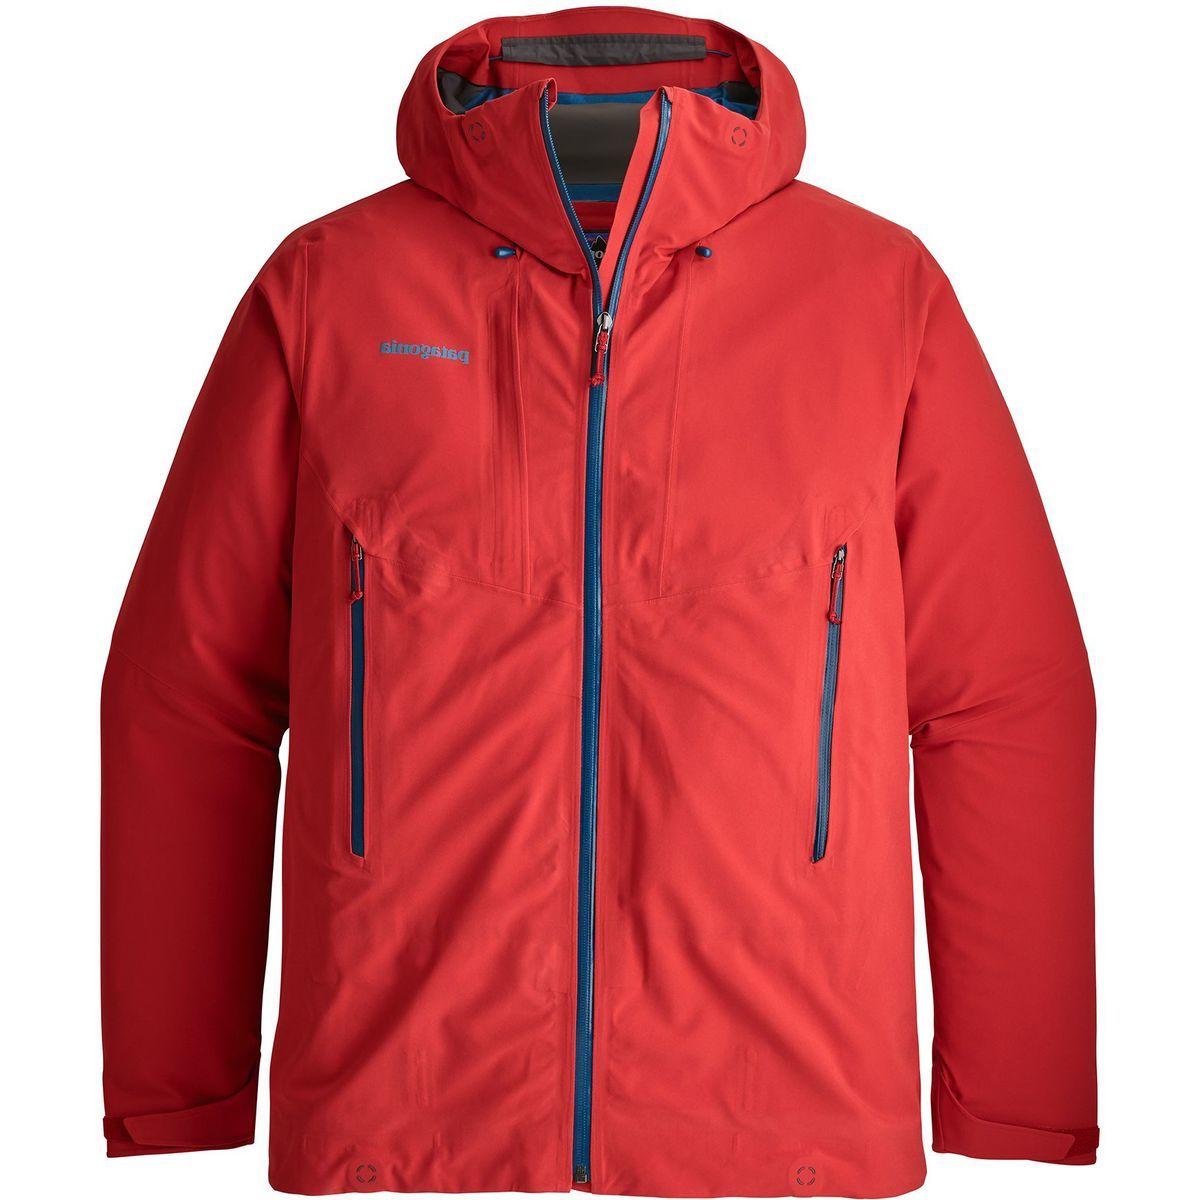 Patagonia Galvanized Jacket - Men's